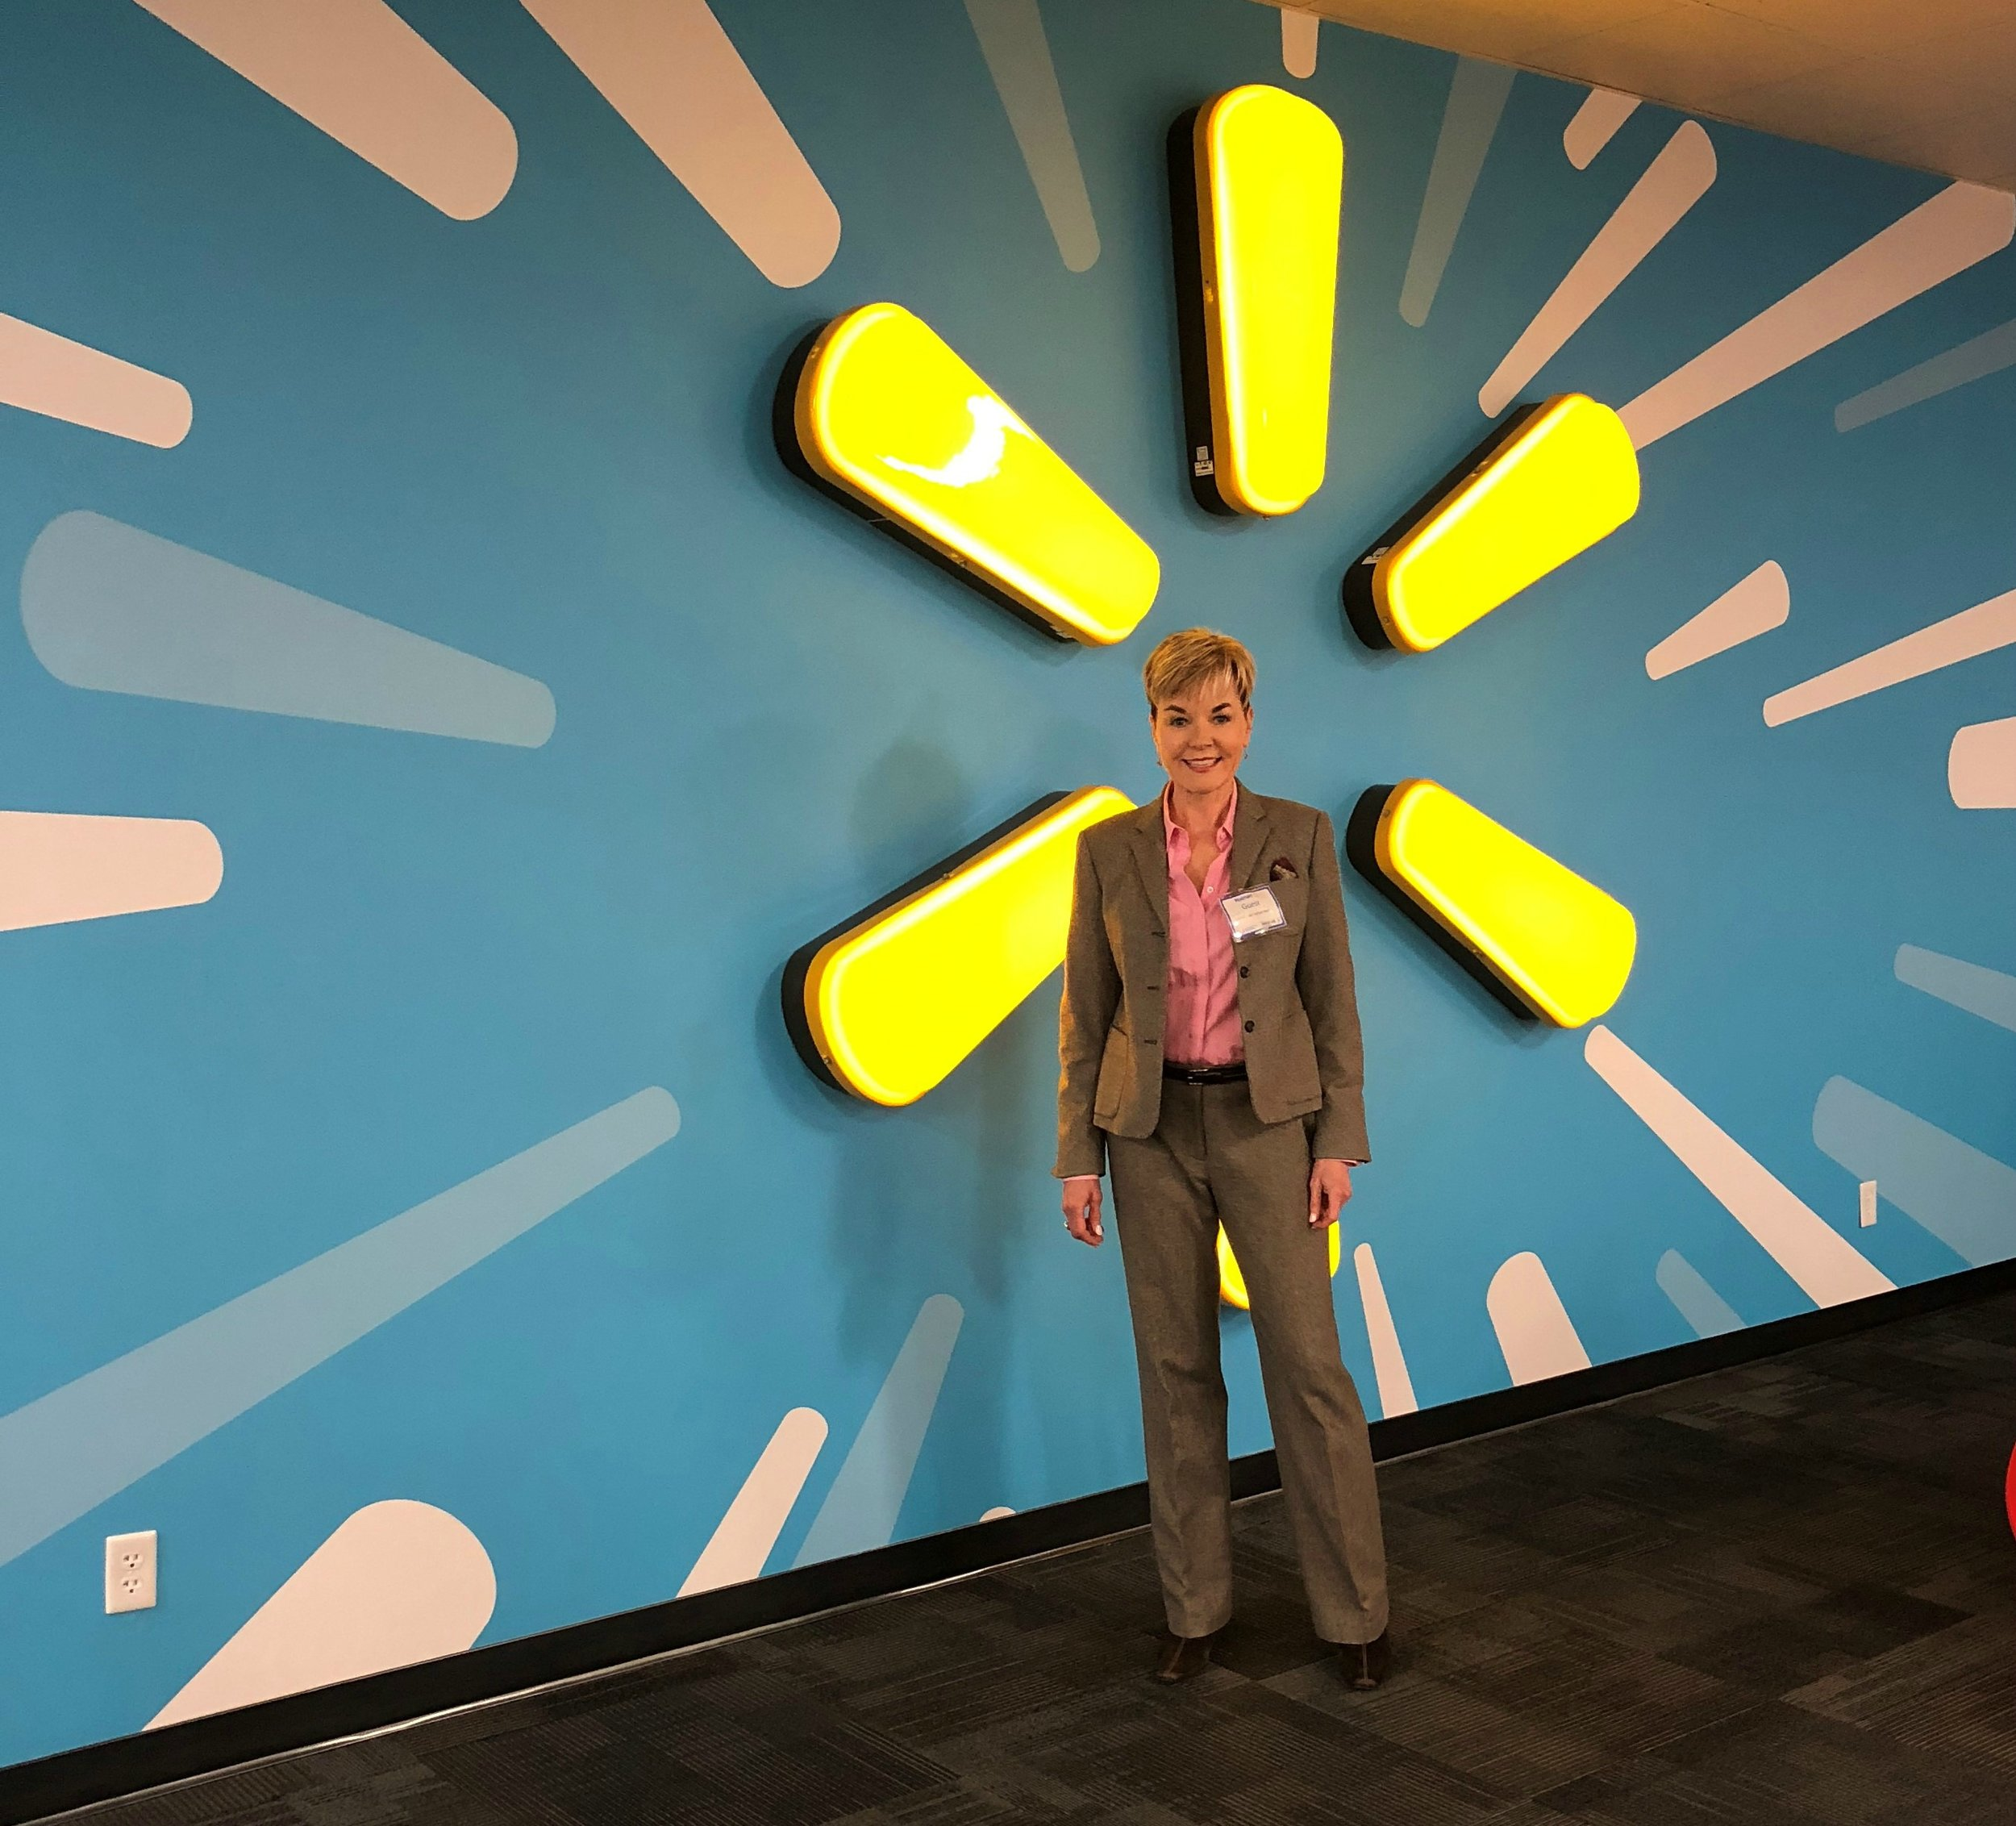 Carol Spieckerman presented her latest Retail Trajectories to Walmart's marketing and merchandising teams